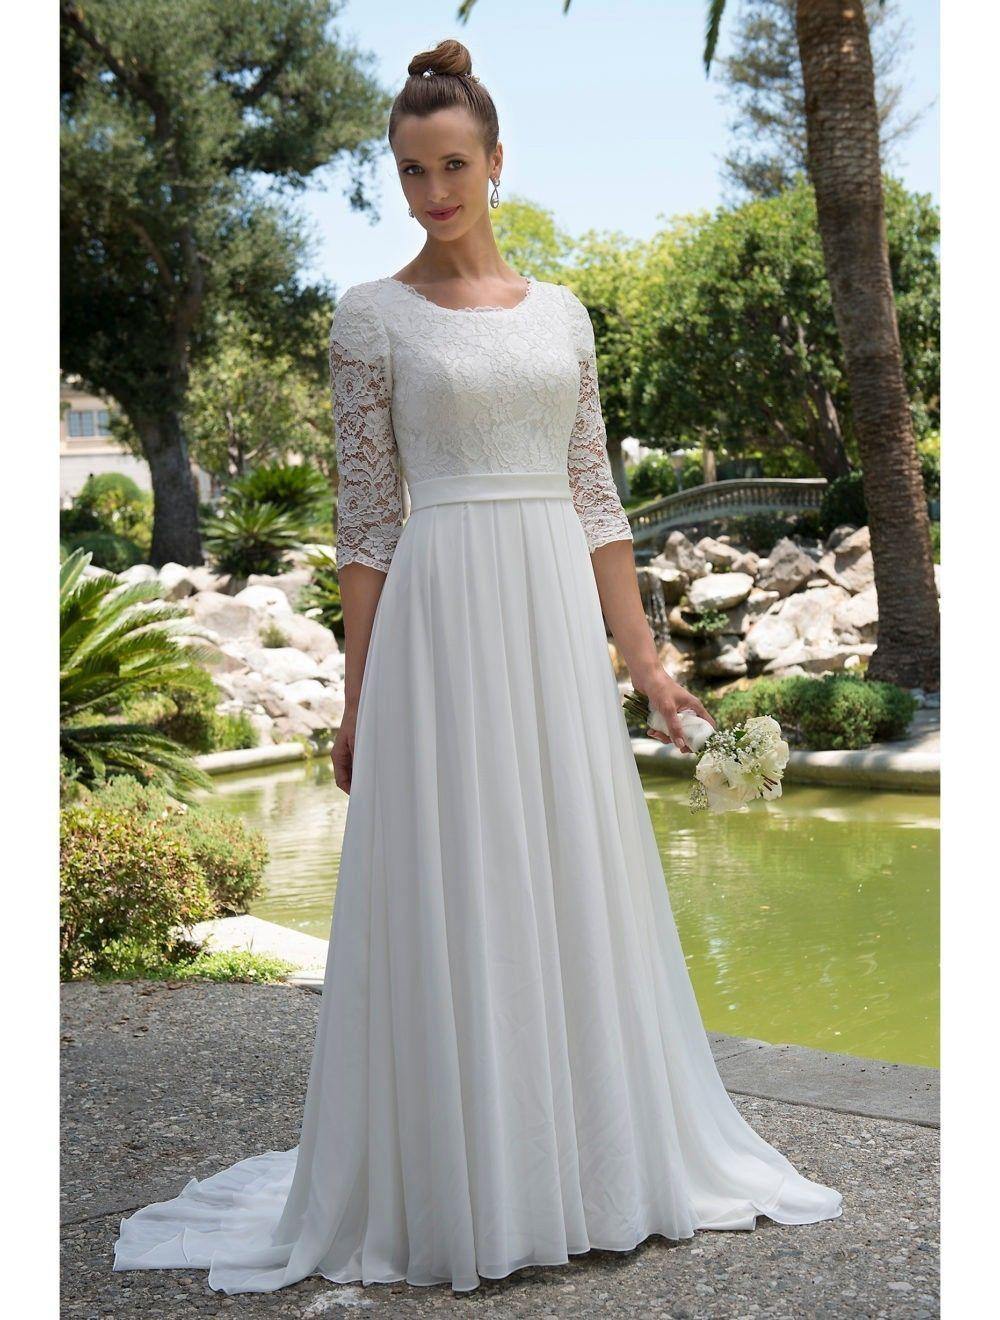 3 4 sleeve lace wedding dress  Cool Amazing  Sleeve Modest Lace Chiffon Wedding Dress White